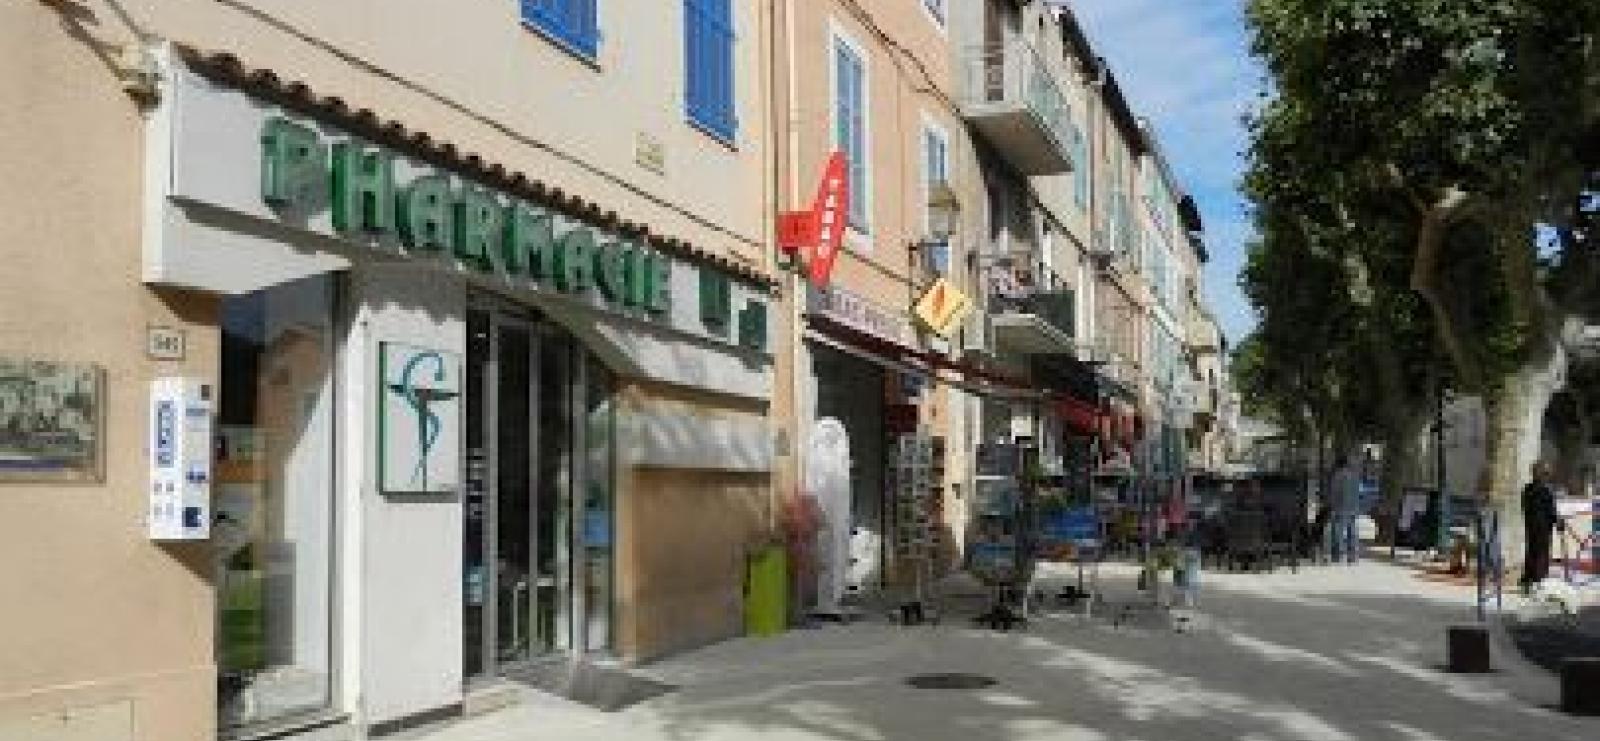 Pharmacie de Bagnols